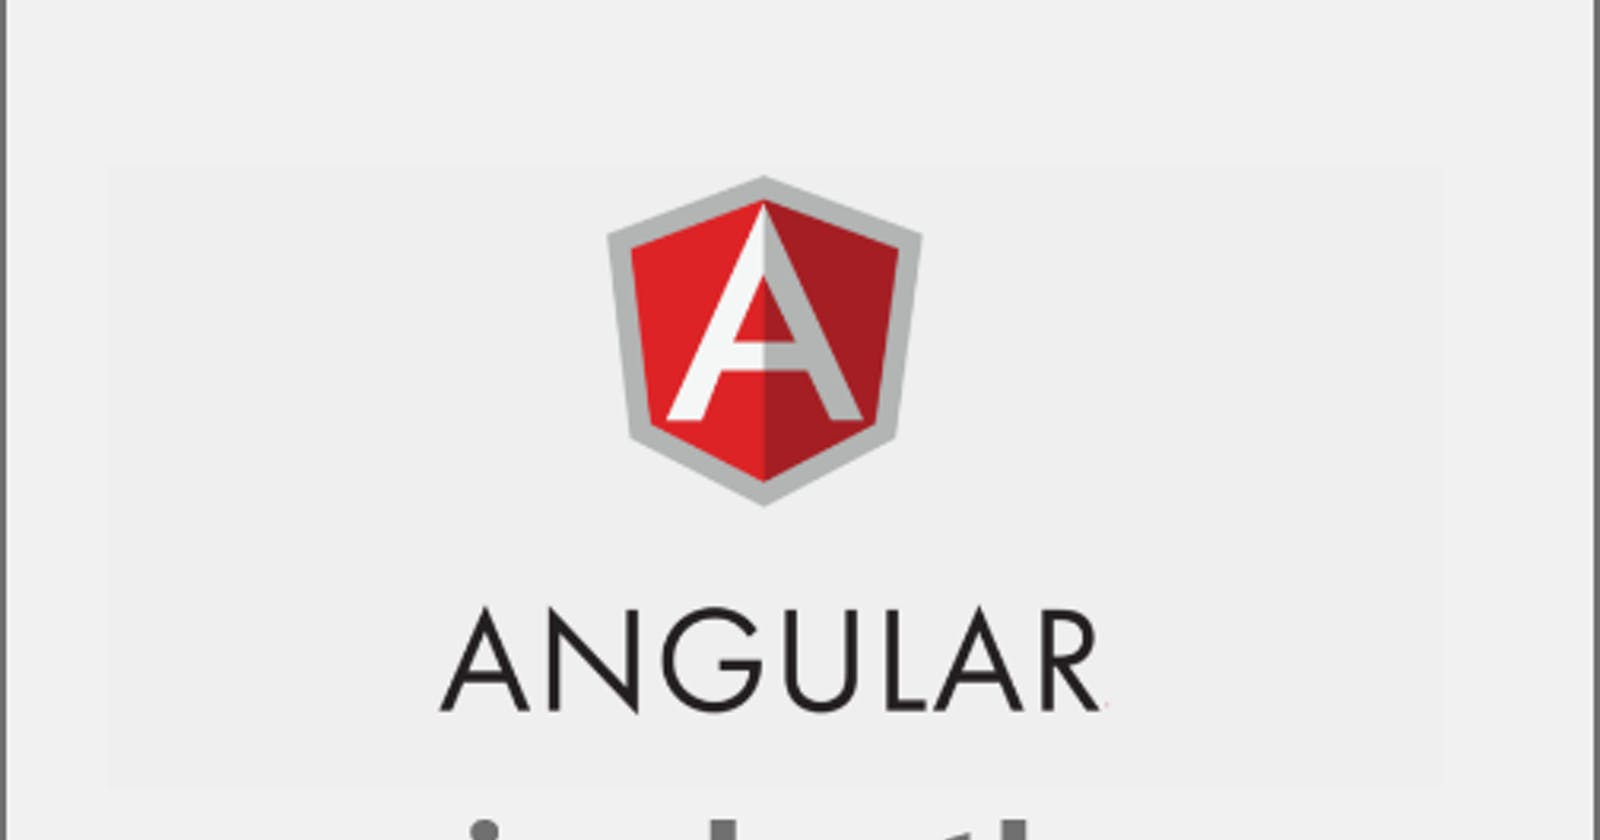 Angular In Depth - Part 1